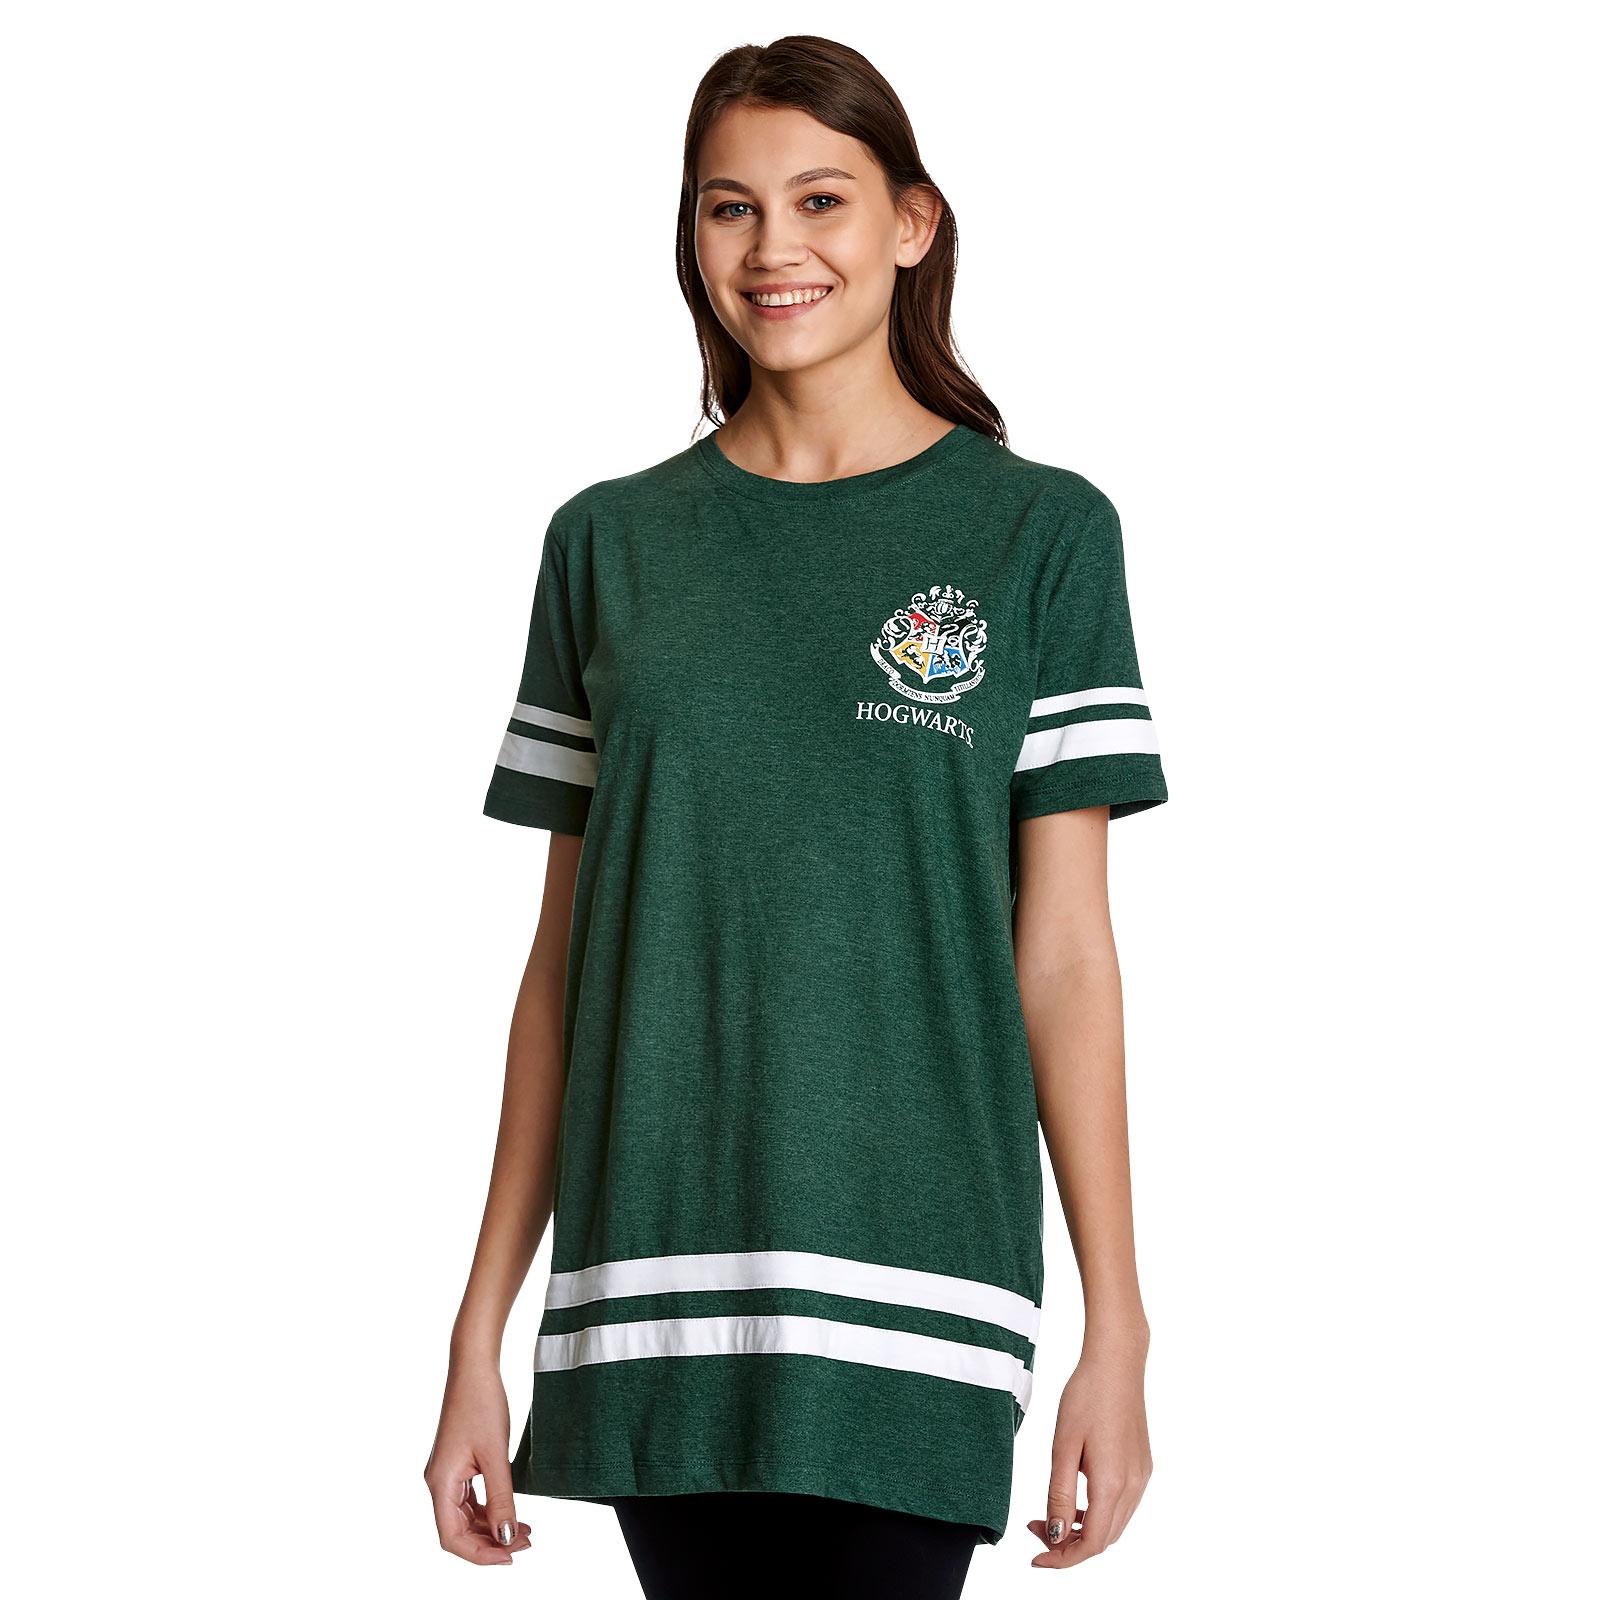 Slytherin Sucher Malfoy Oversize T-Shirt Damen grün - Harry Potter